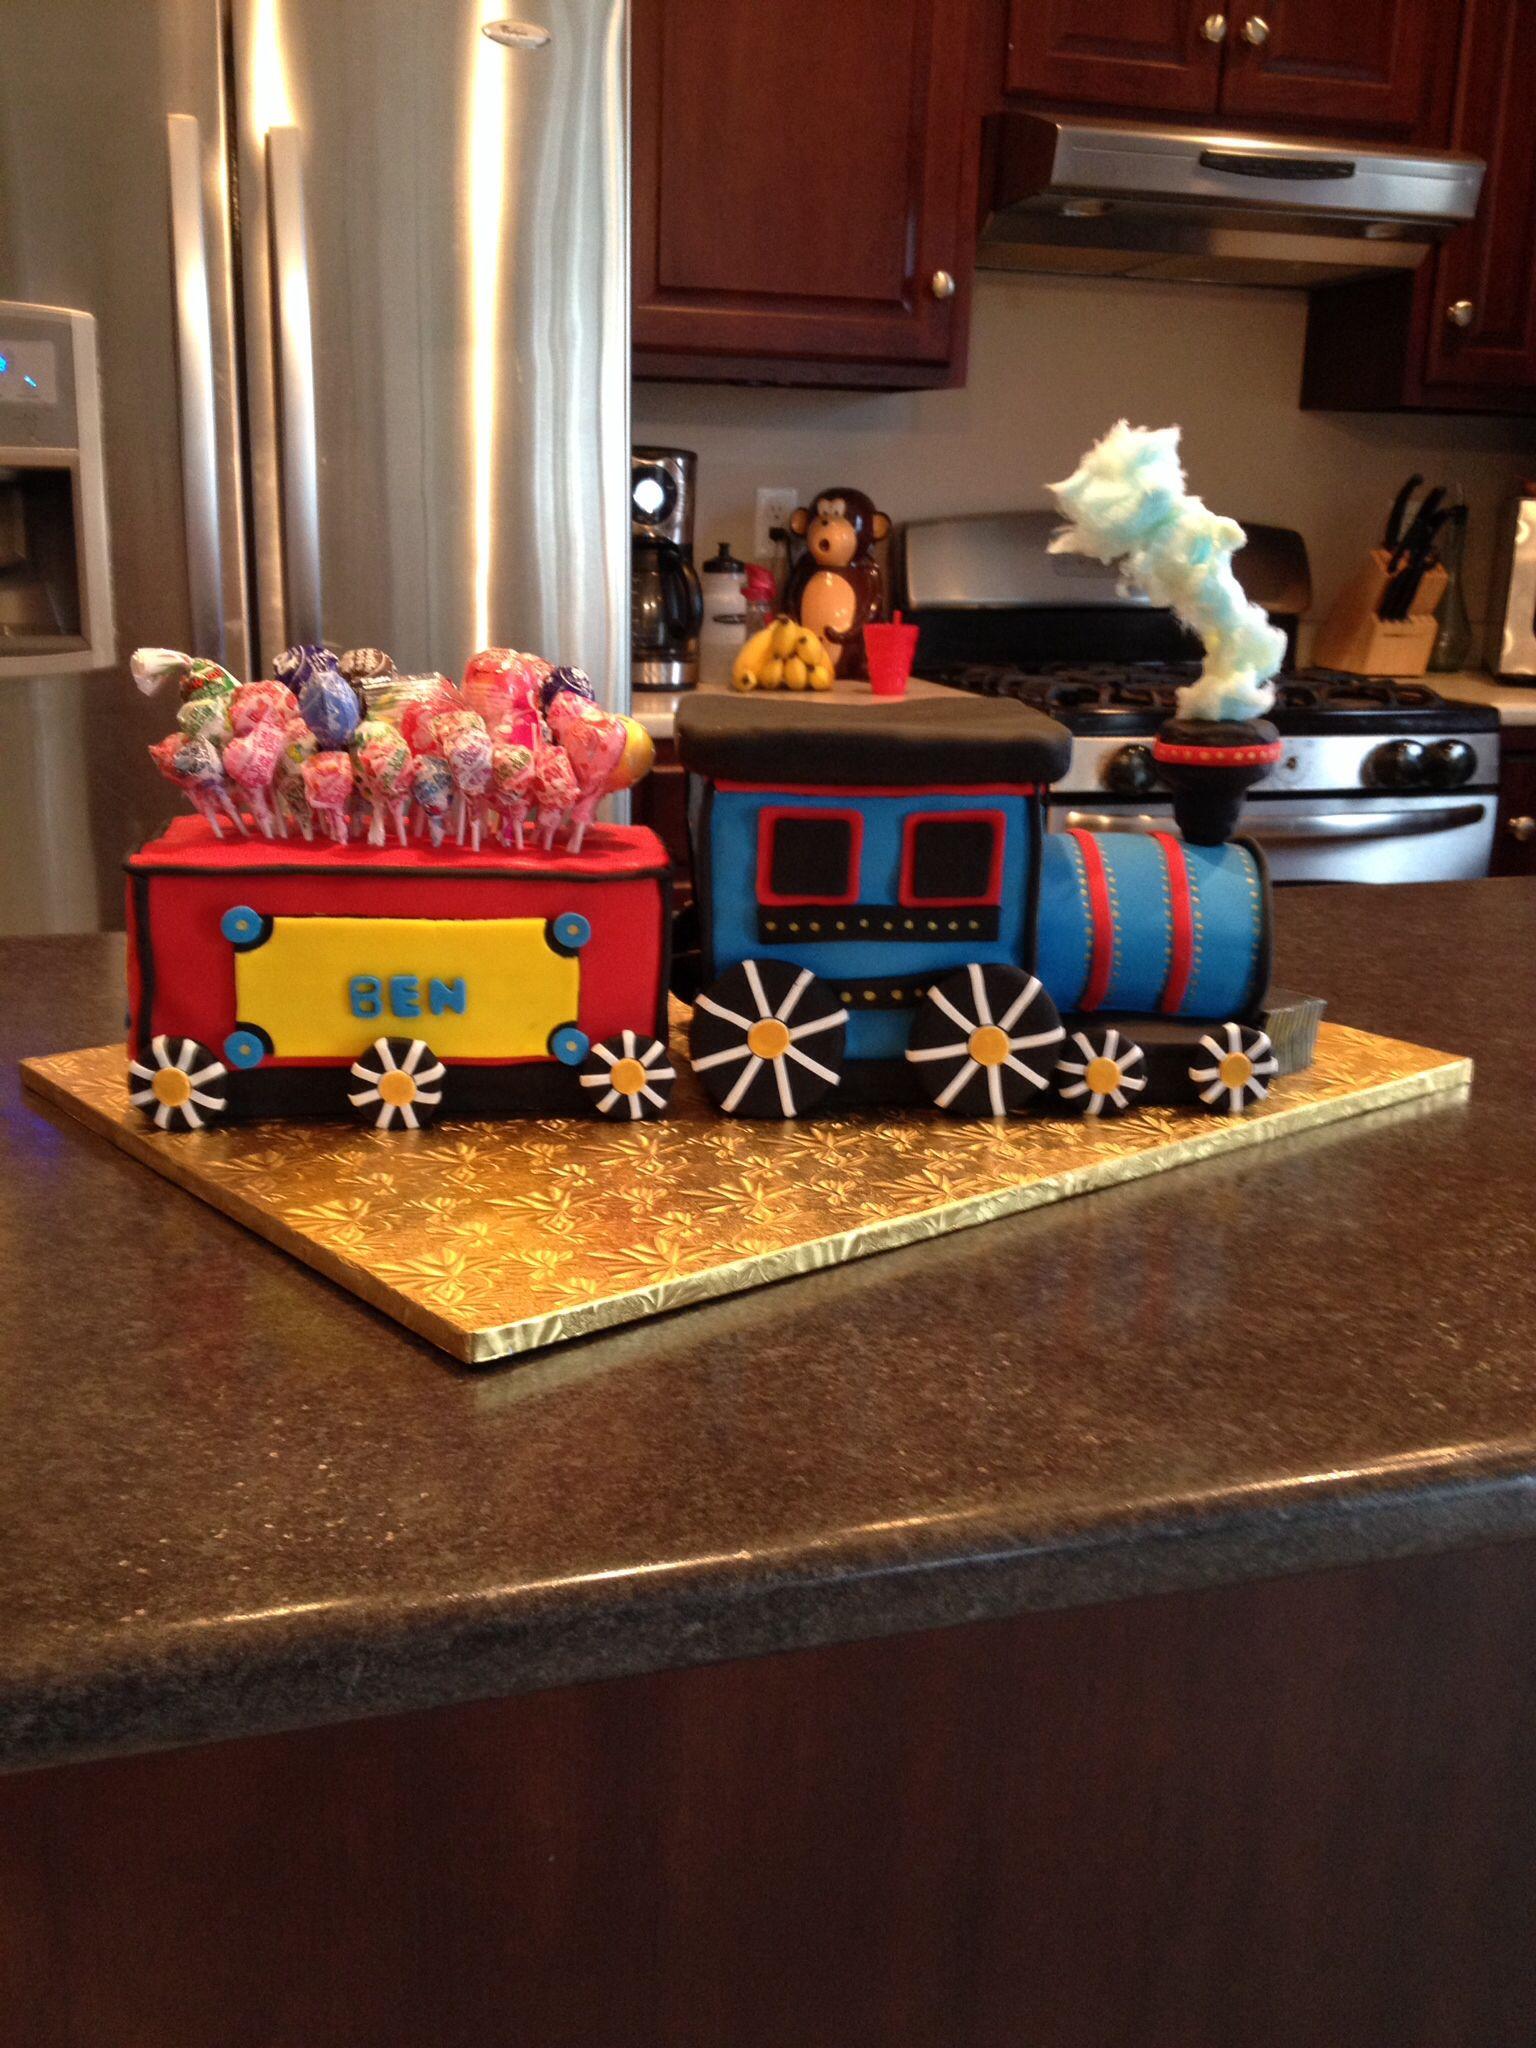 Choo choo train cake! Cotton candy for steam! | Train cake ...